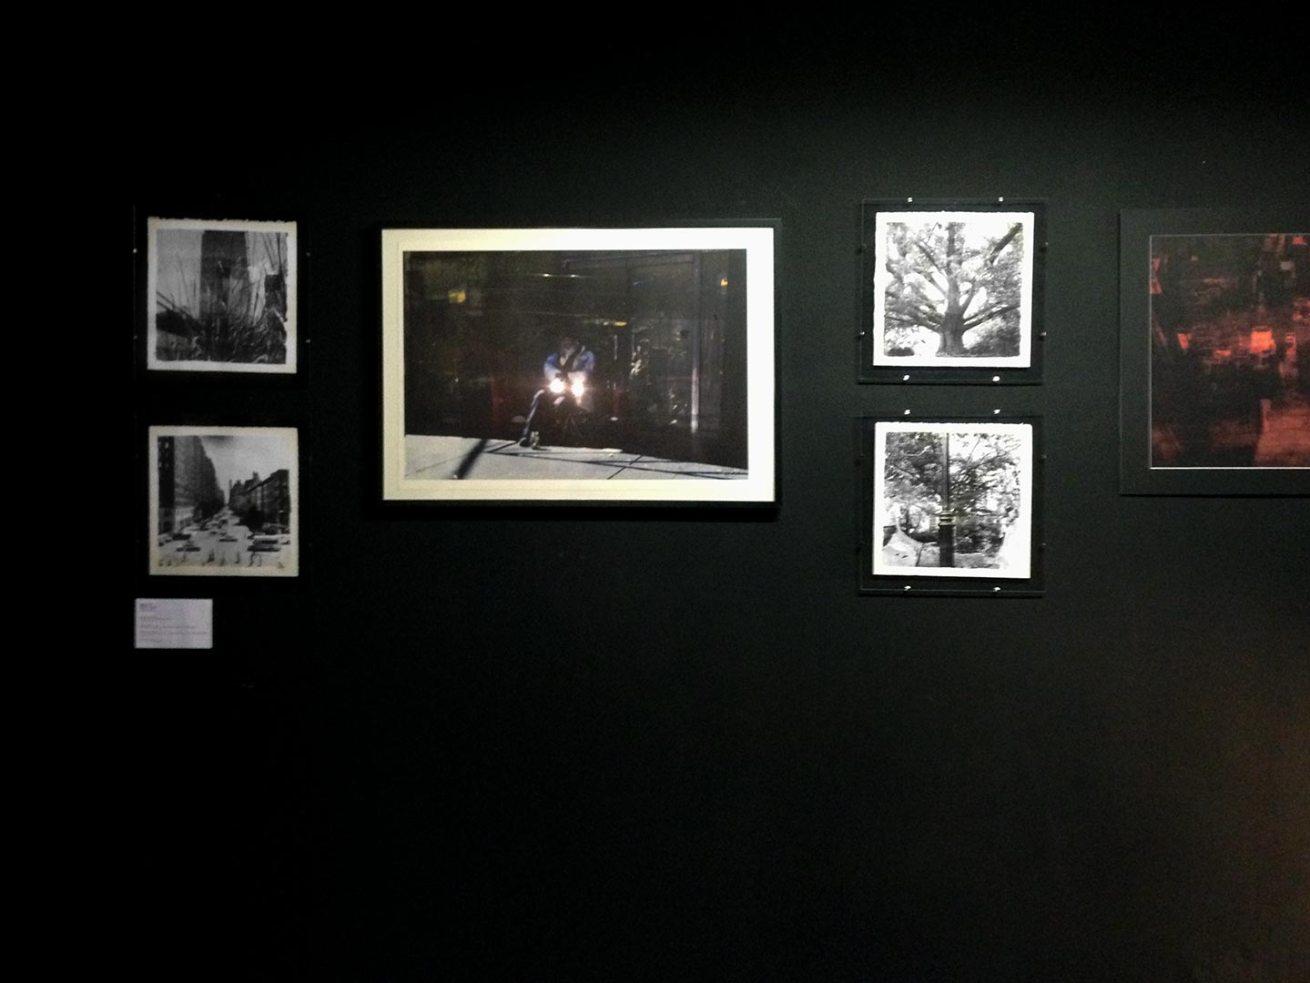 1/2 douzaine photographique brief insight, Helene de Valon & Ryc'ho Ryszard Swierad